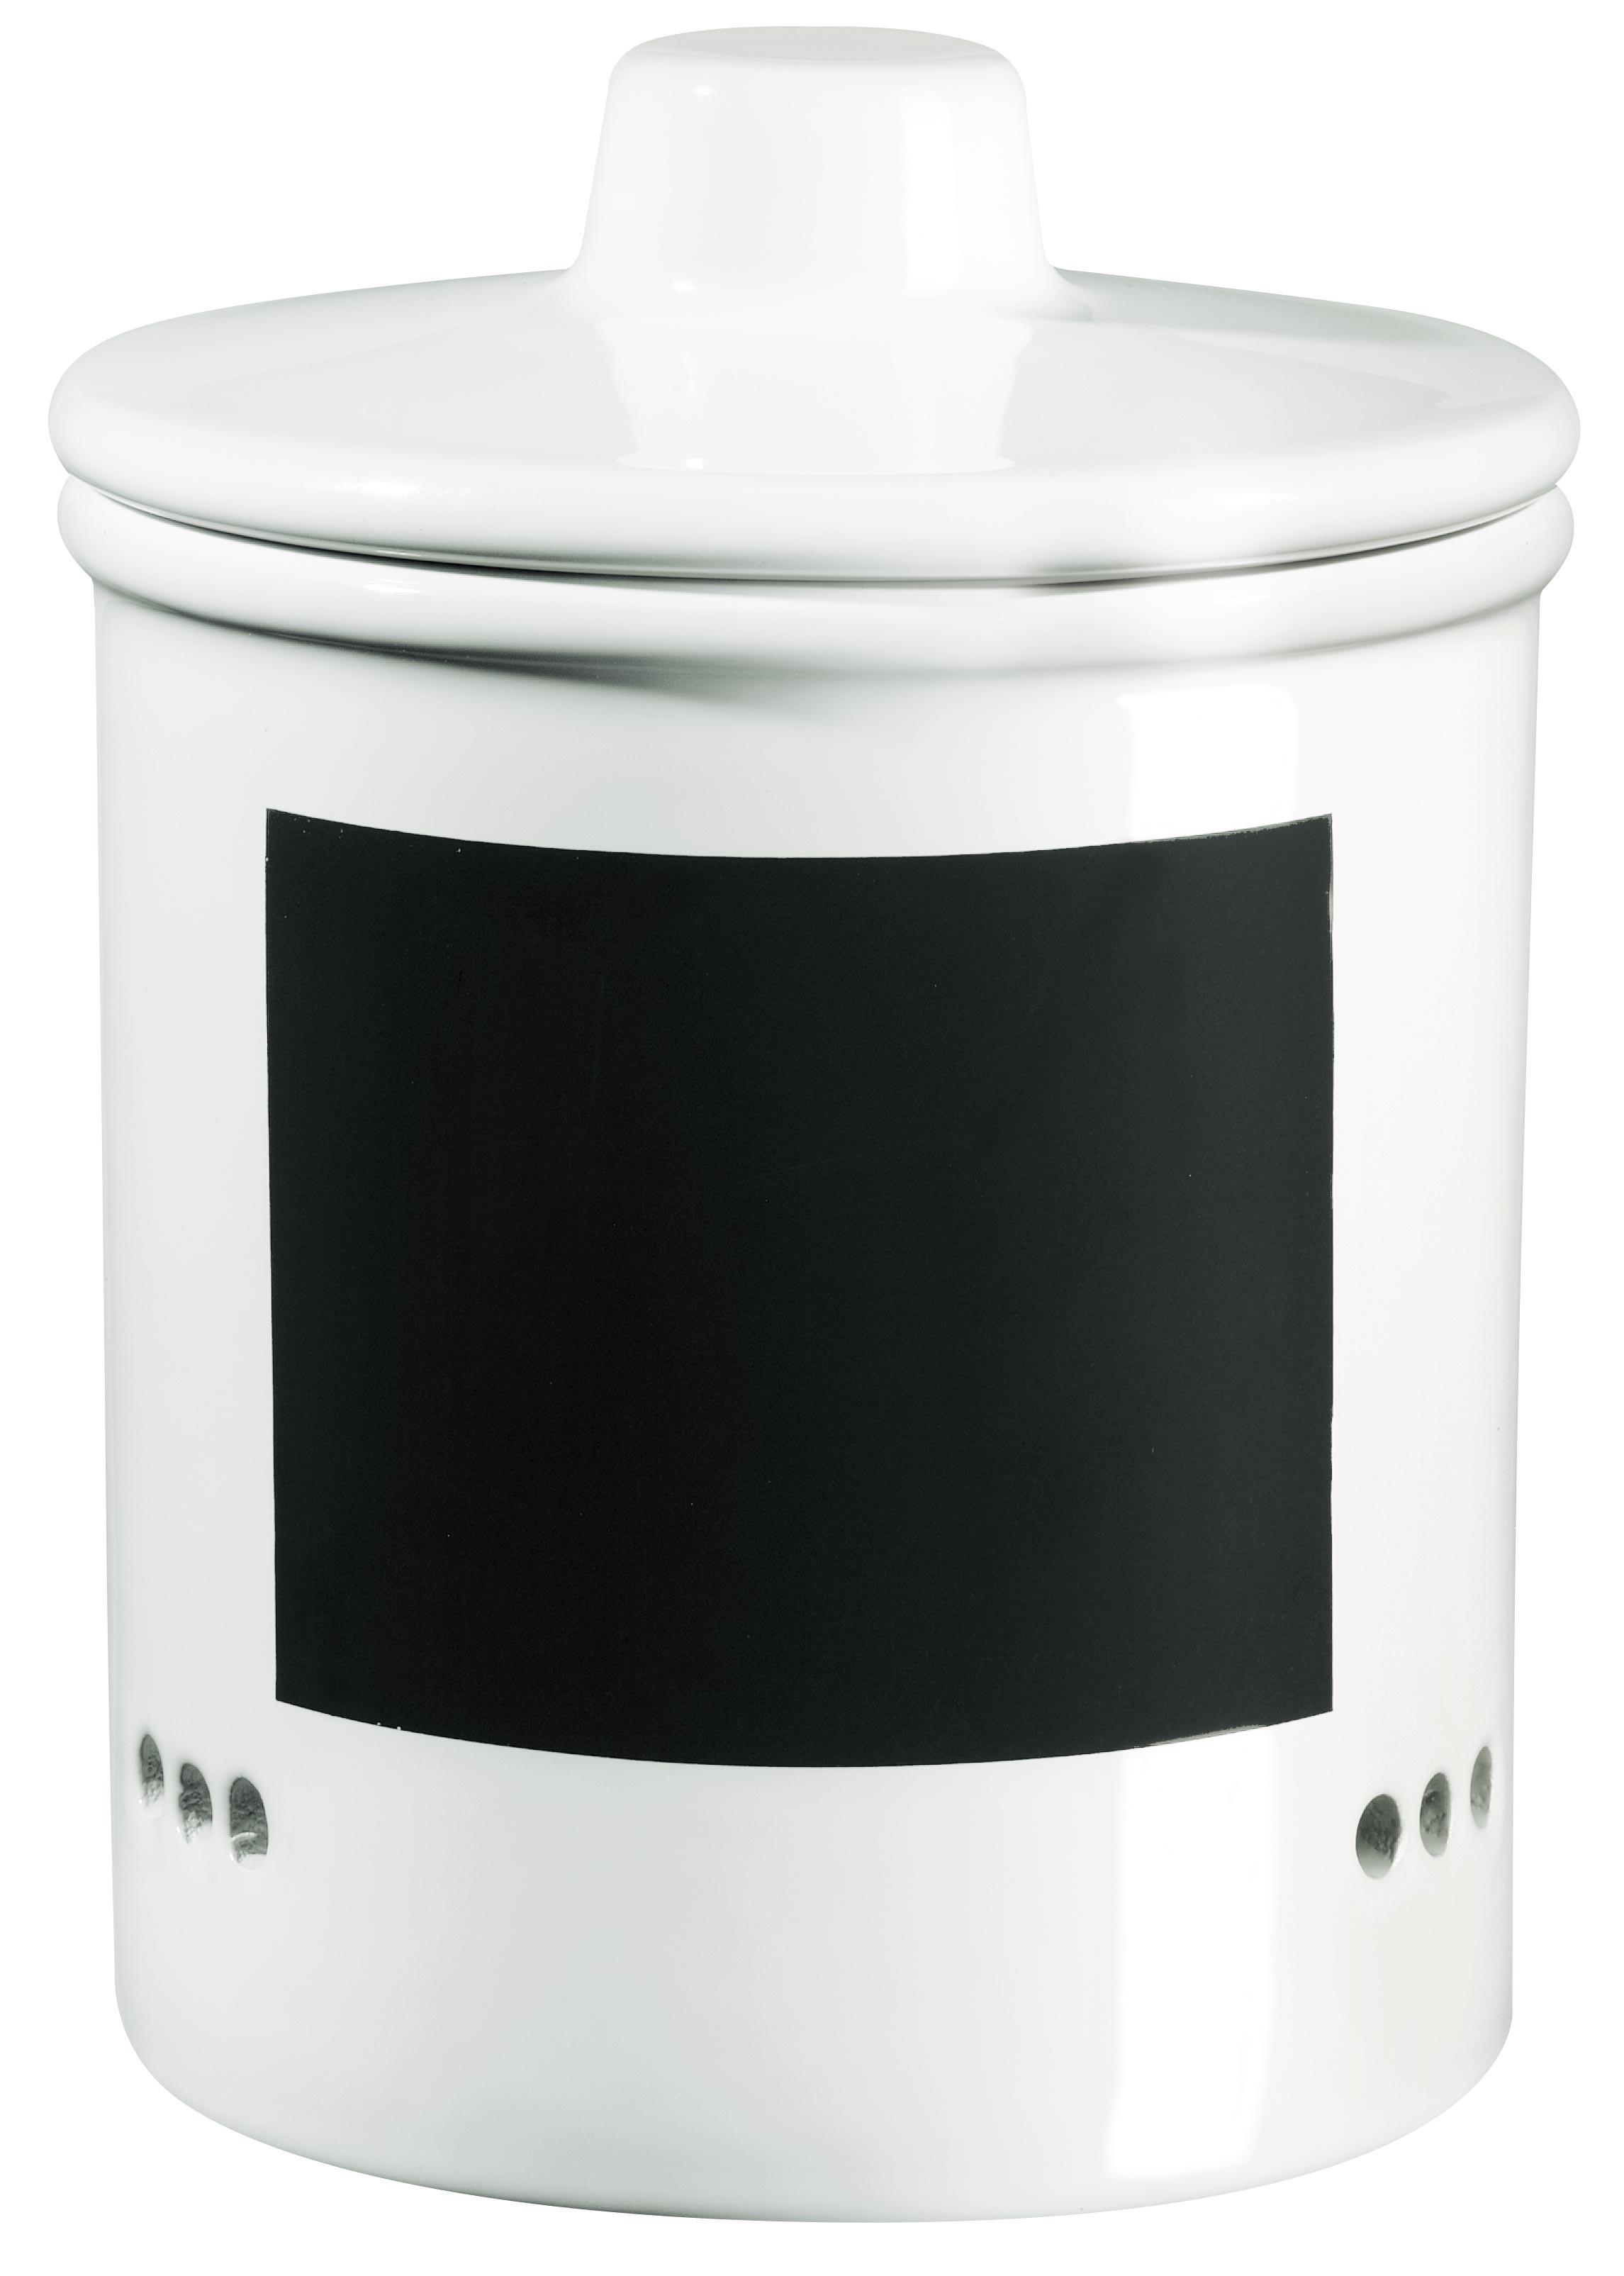 d 13 5 cm h 17 cm home by asa die asa selection wohnwelten. Black Bedroom Furniture Sets. Home Design Ideas